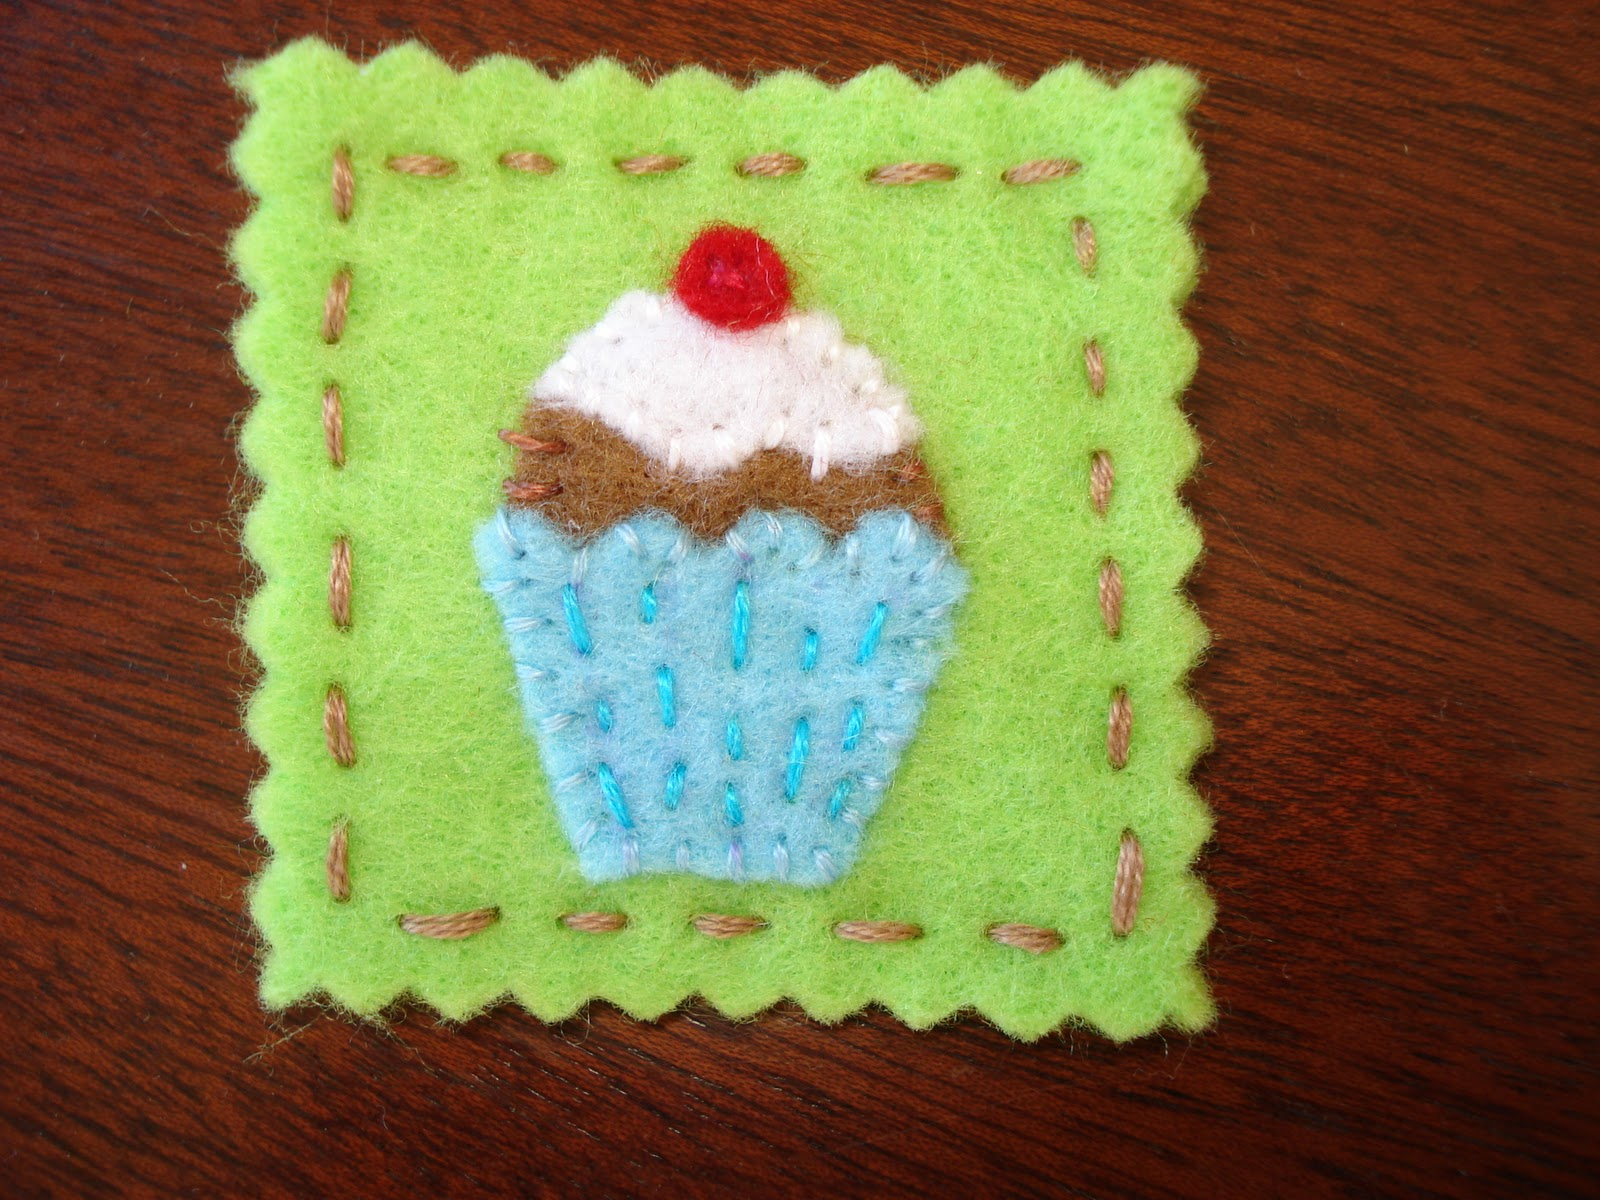 Patrón para borche de fieltro con forma cupcake